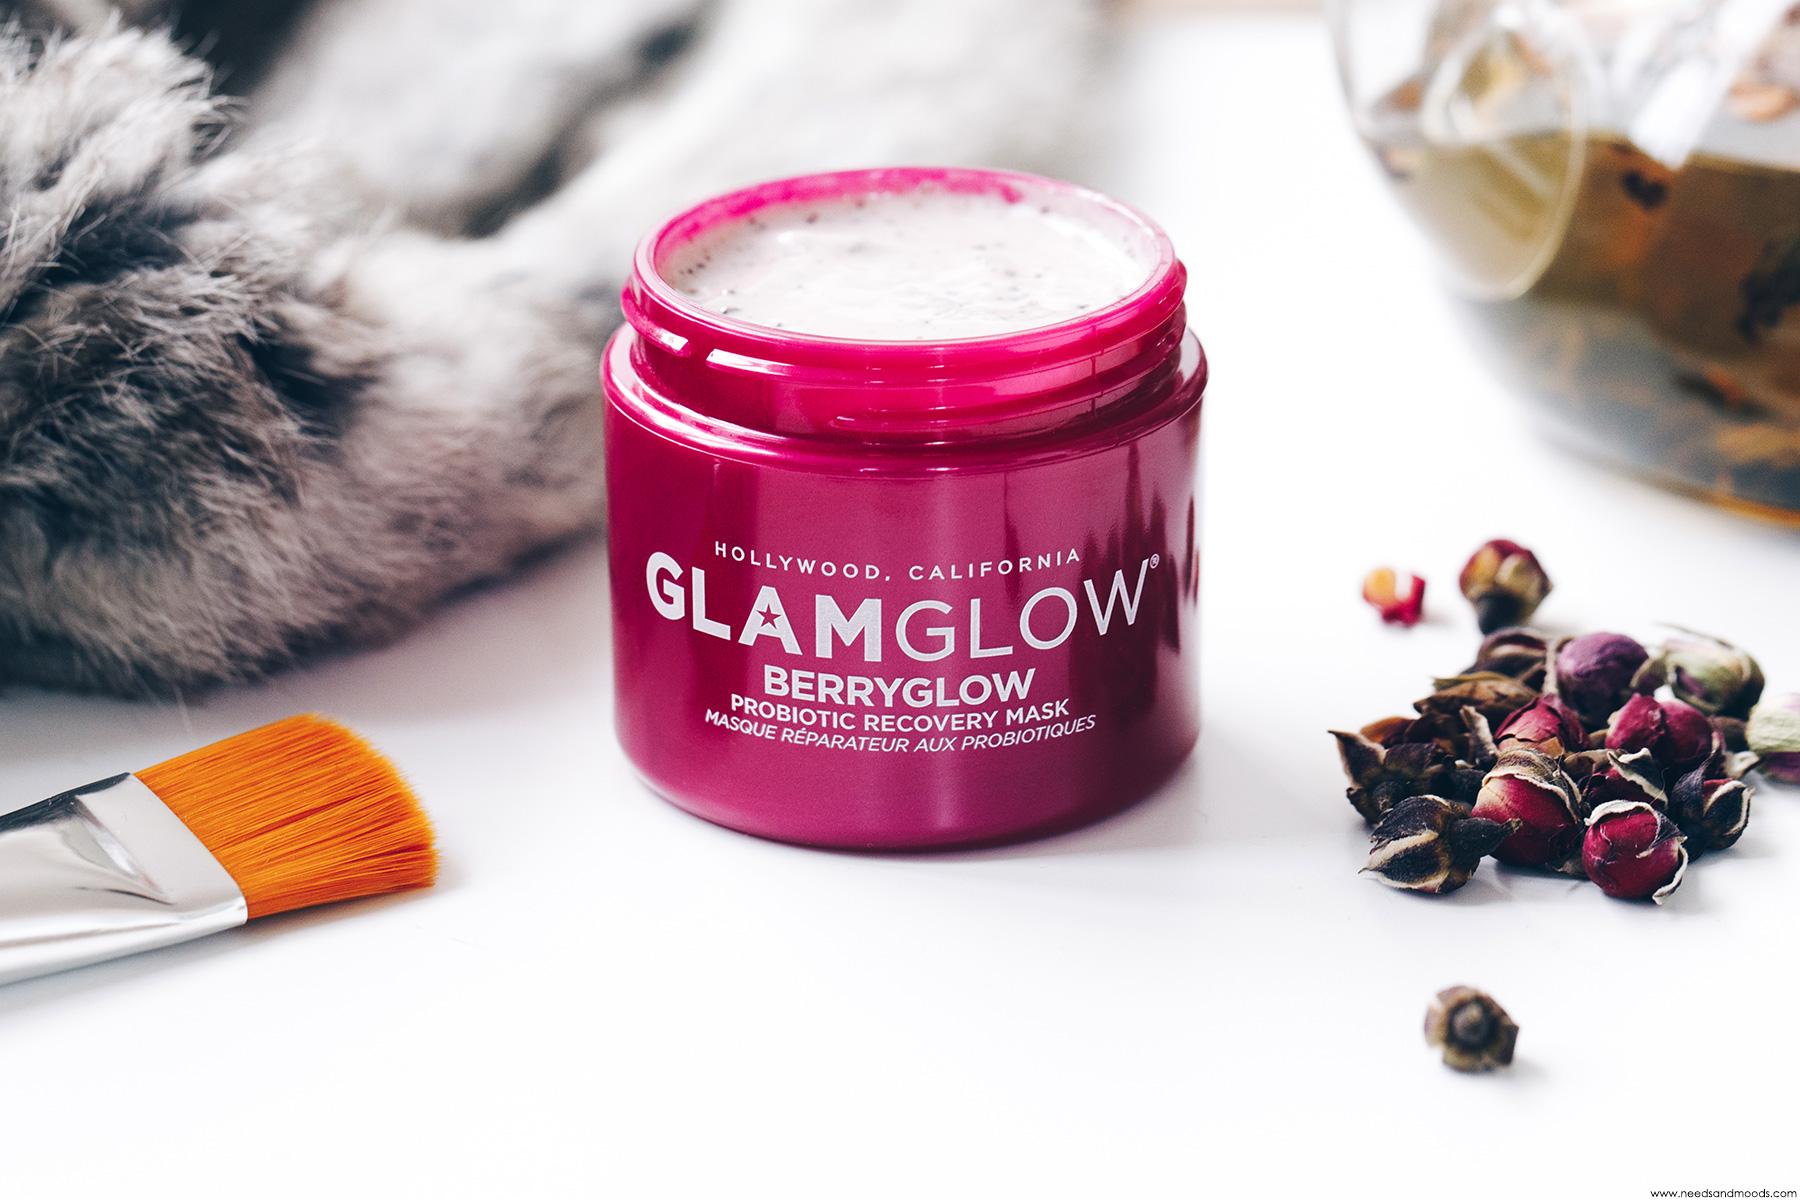 glamglow masque berryglow